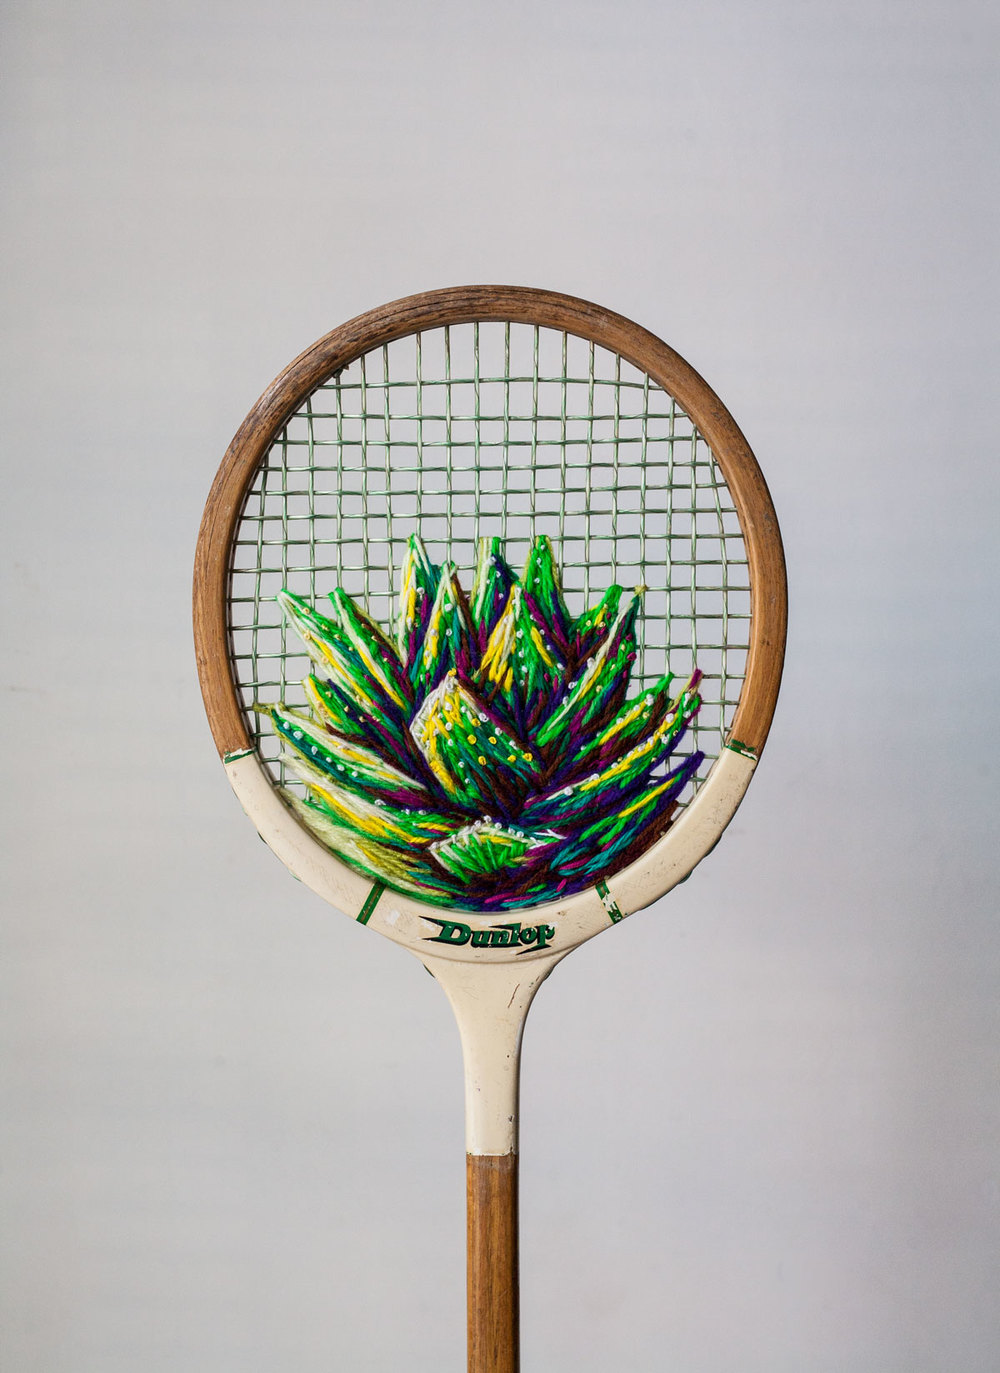 danielle-clough-racket-goodfromyou-2.jpg